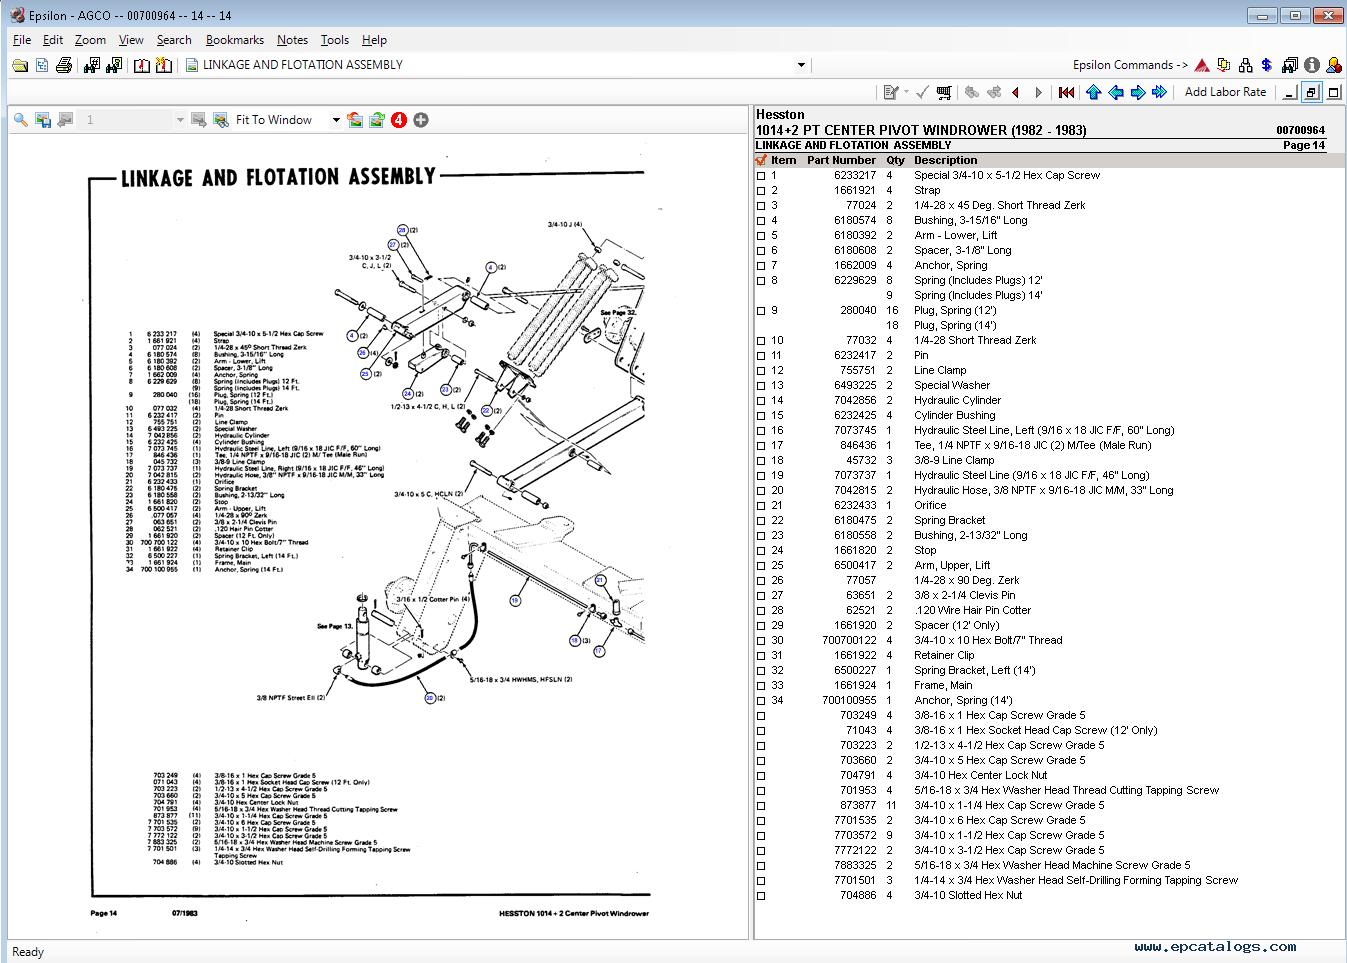 Mf 1130 Wiring Diagram - 1966 Mustang Wiring Schematics -  dumbleee.lalu.decorresine.itWiring Diagram Resource